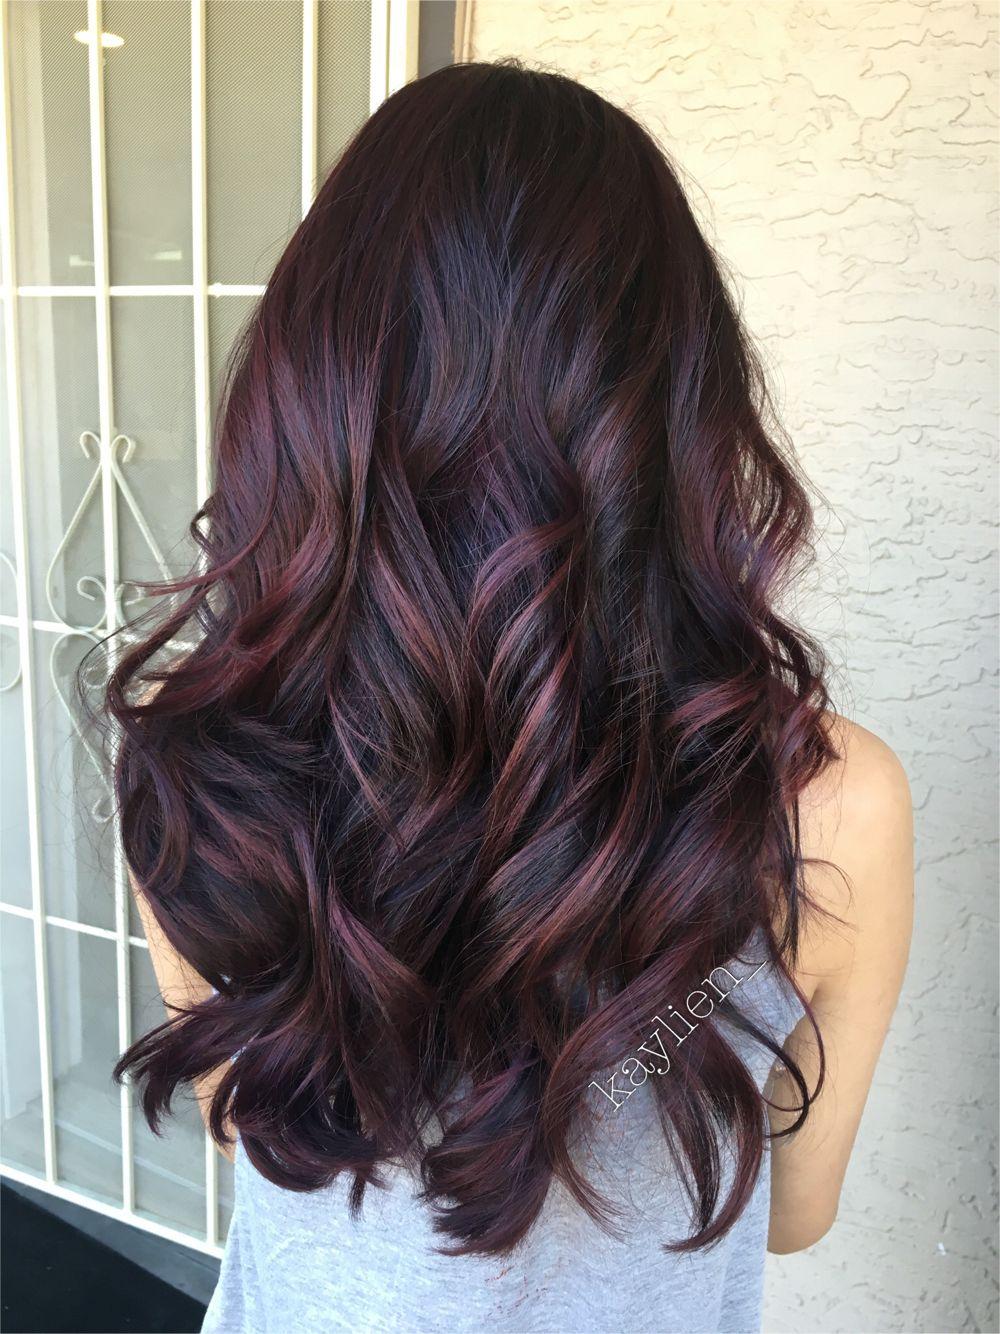 67 Purple Tint Hair Picture Hair Styles Spring Hair Color Plum Hair